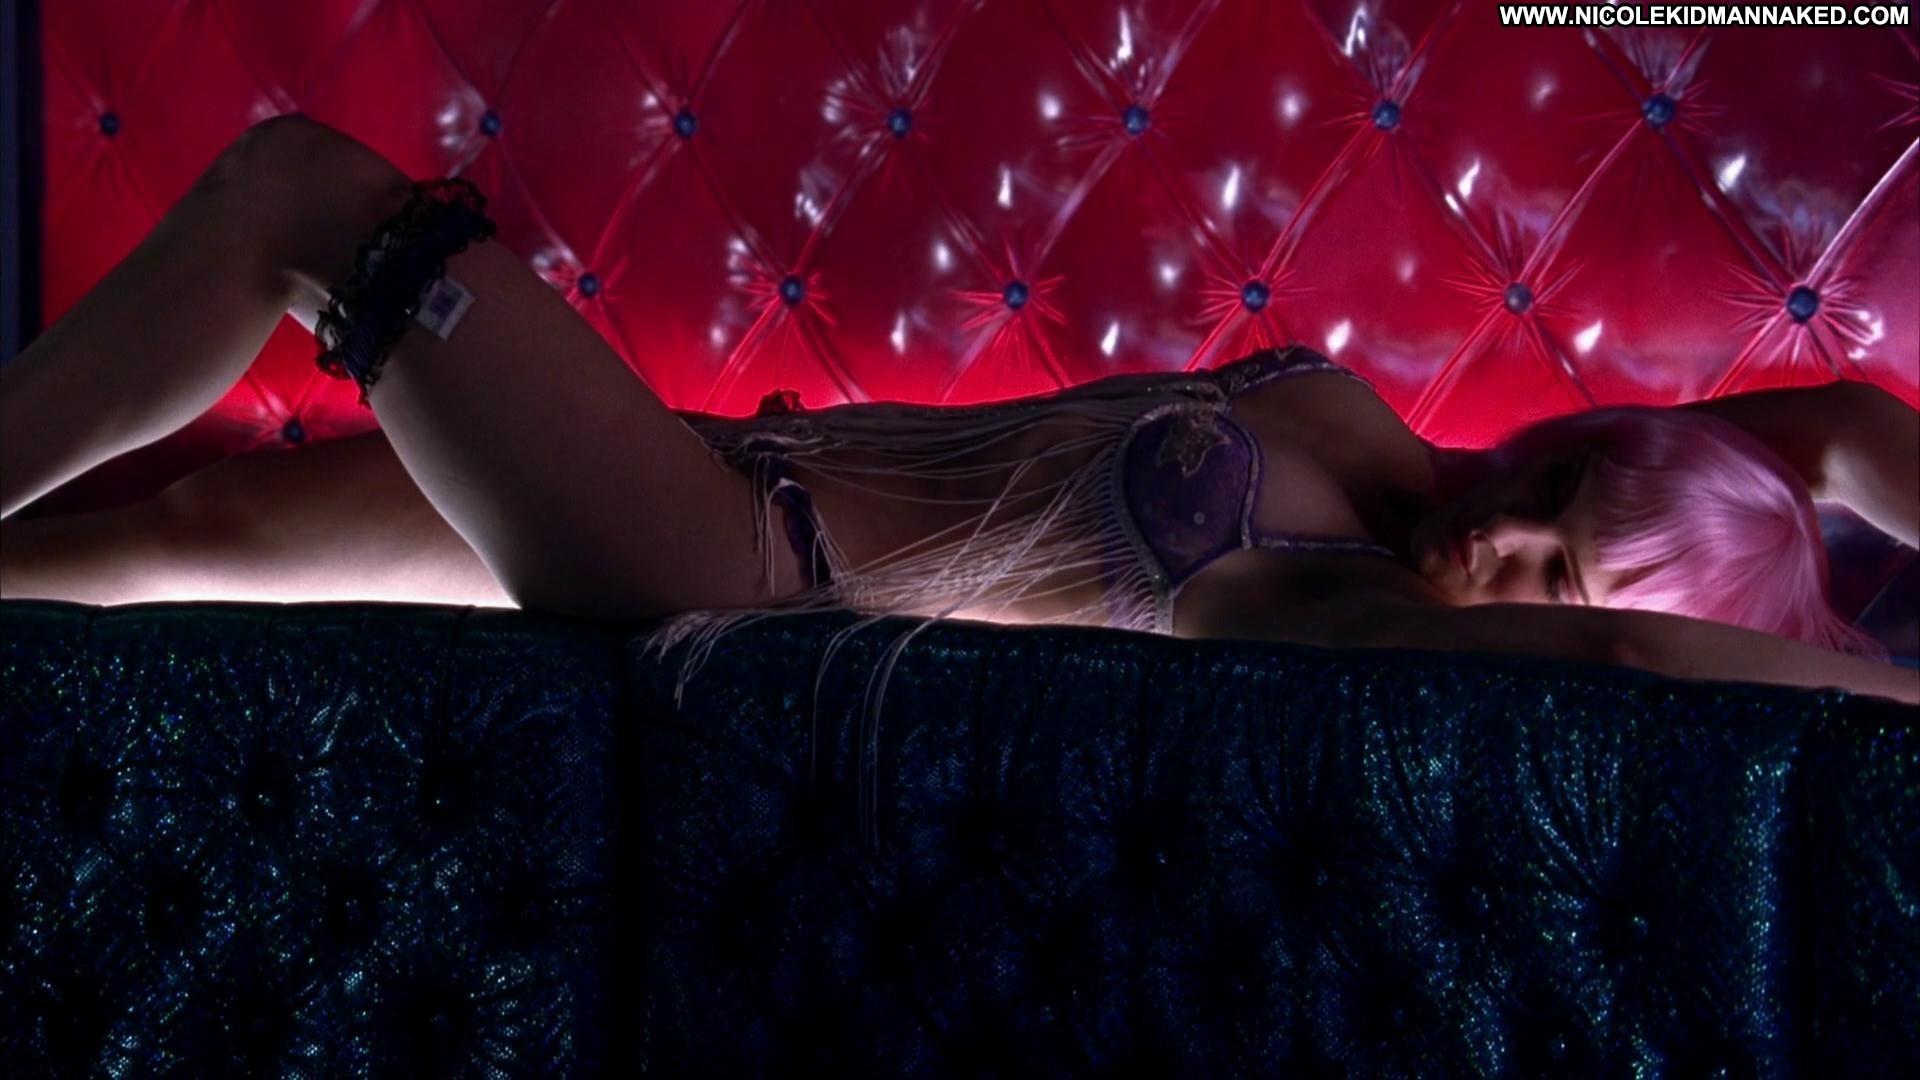 natalie-portman-closer-deleted-paris-hilton-hot-sexy-naked